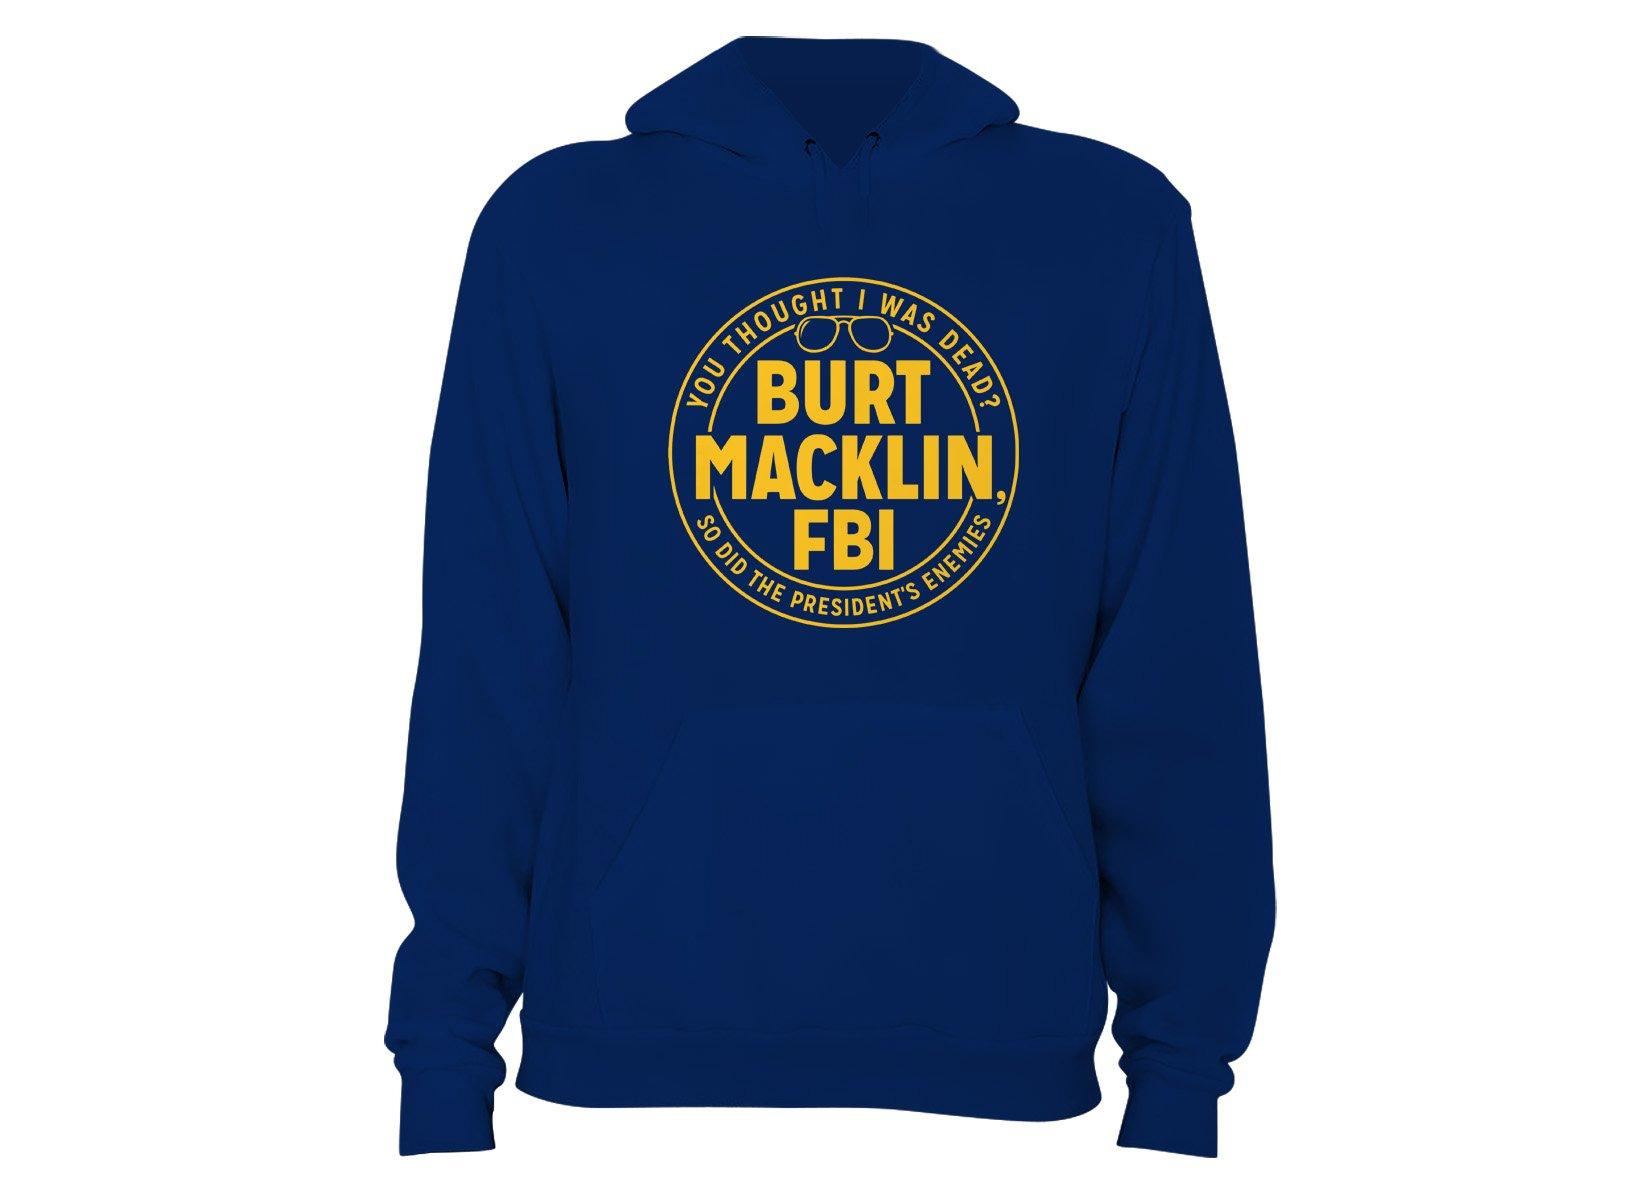 Burt Macklin, FBI on Hoodie